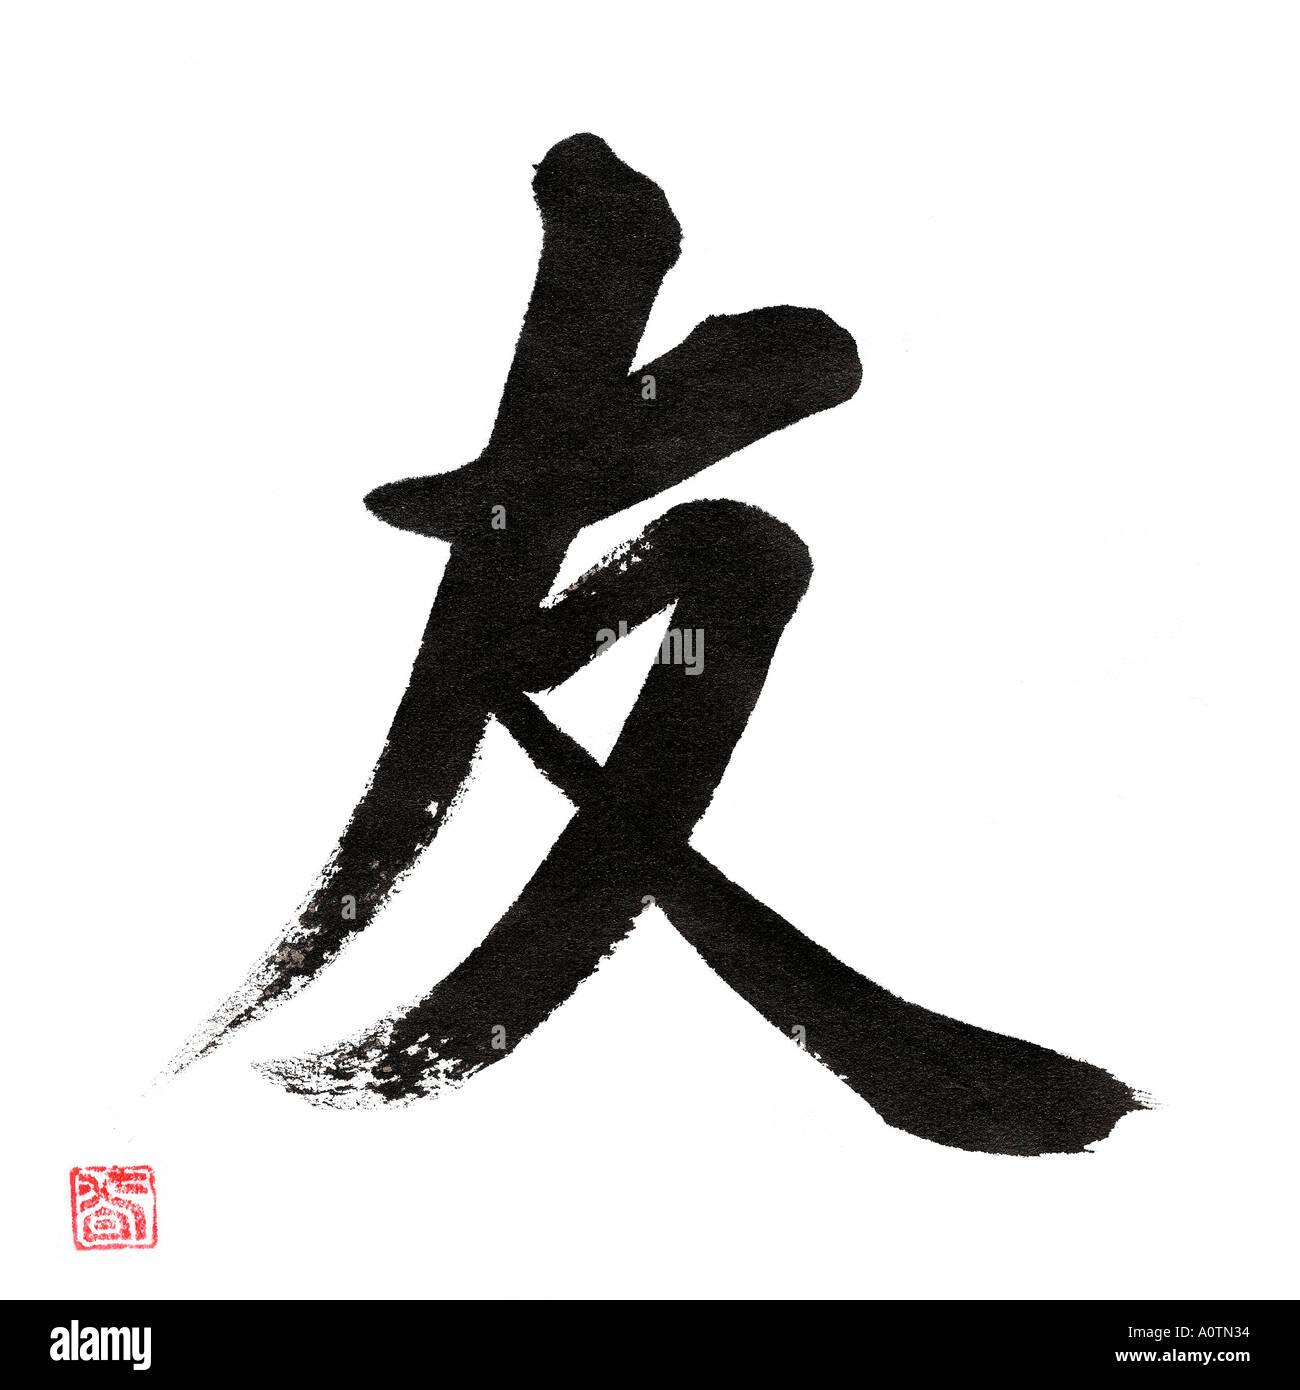 Japanese Art Stock Photos & Japanese Art Stock Images - Alamy